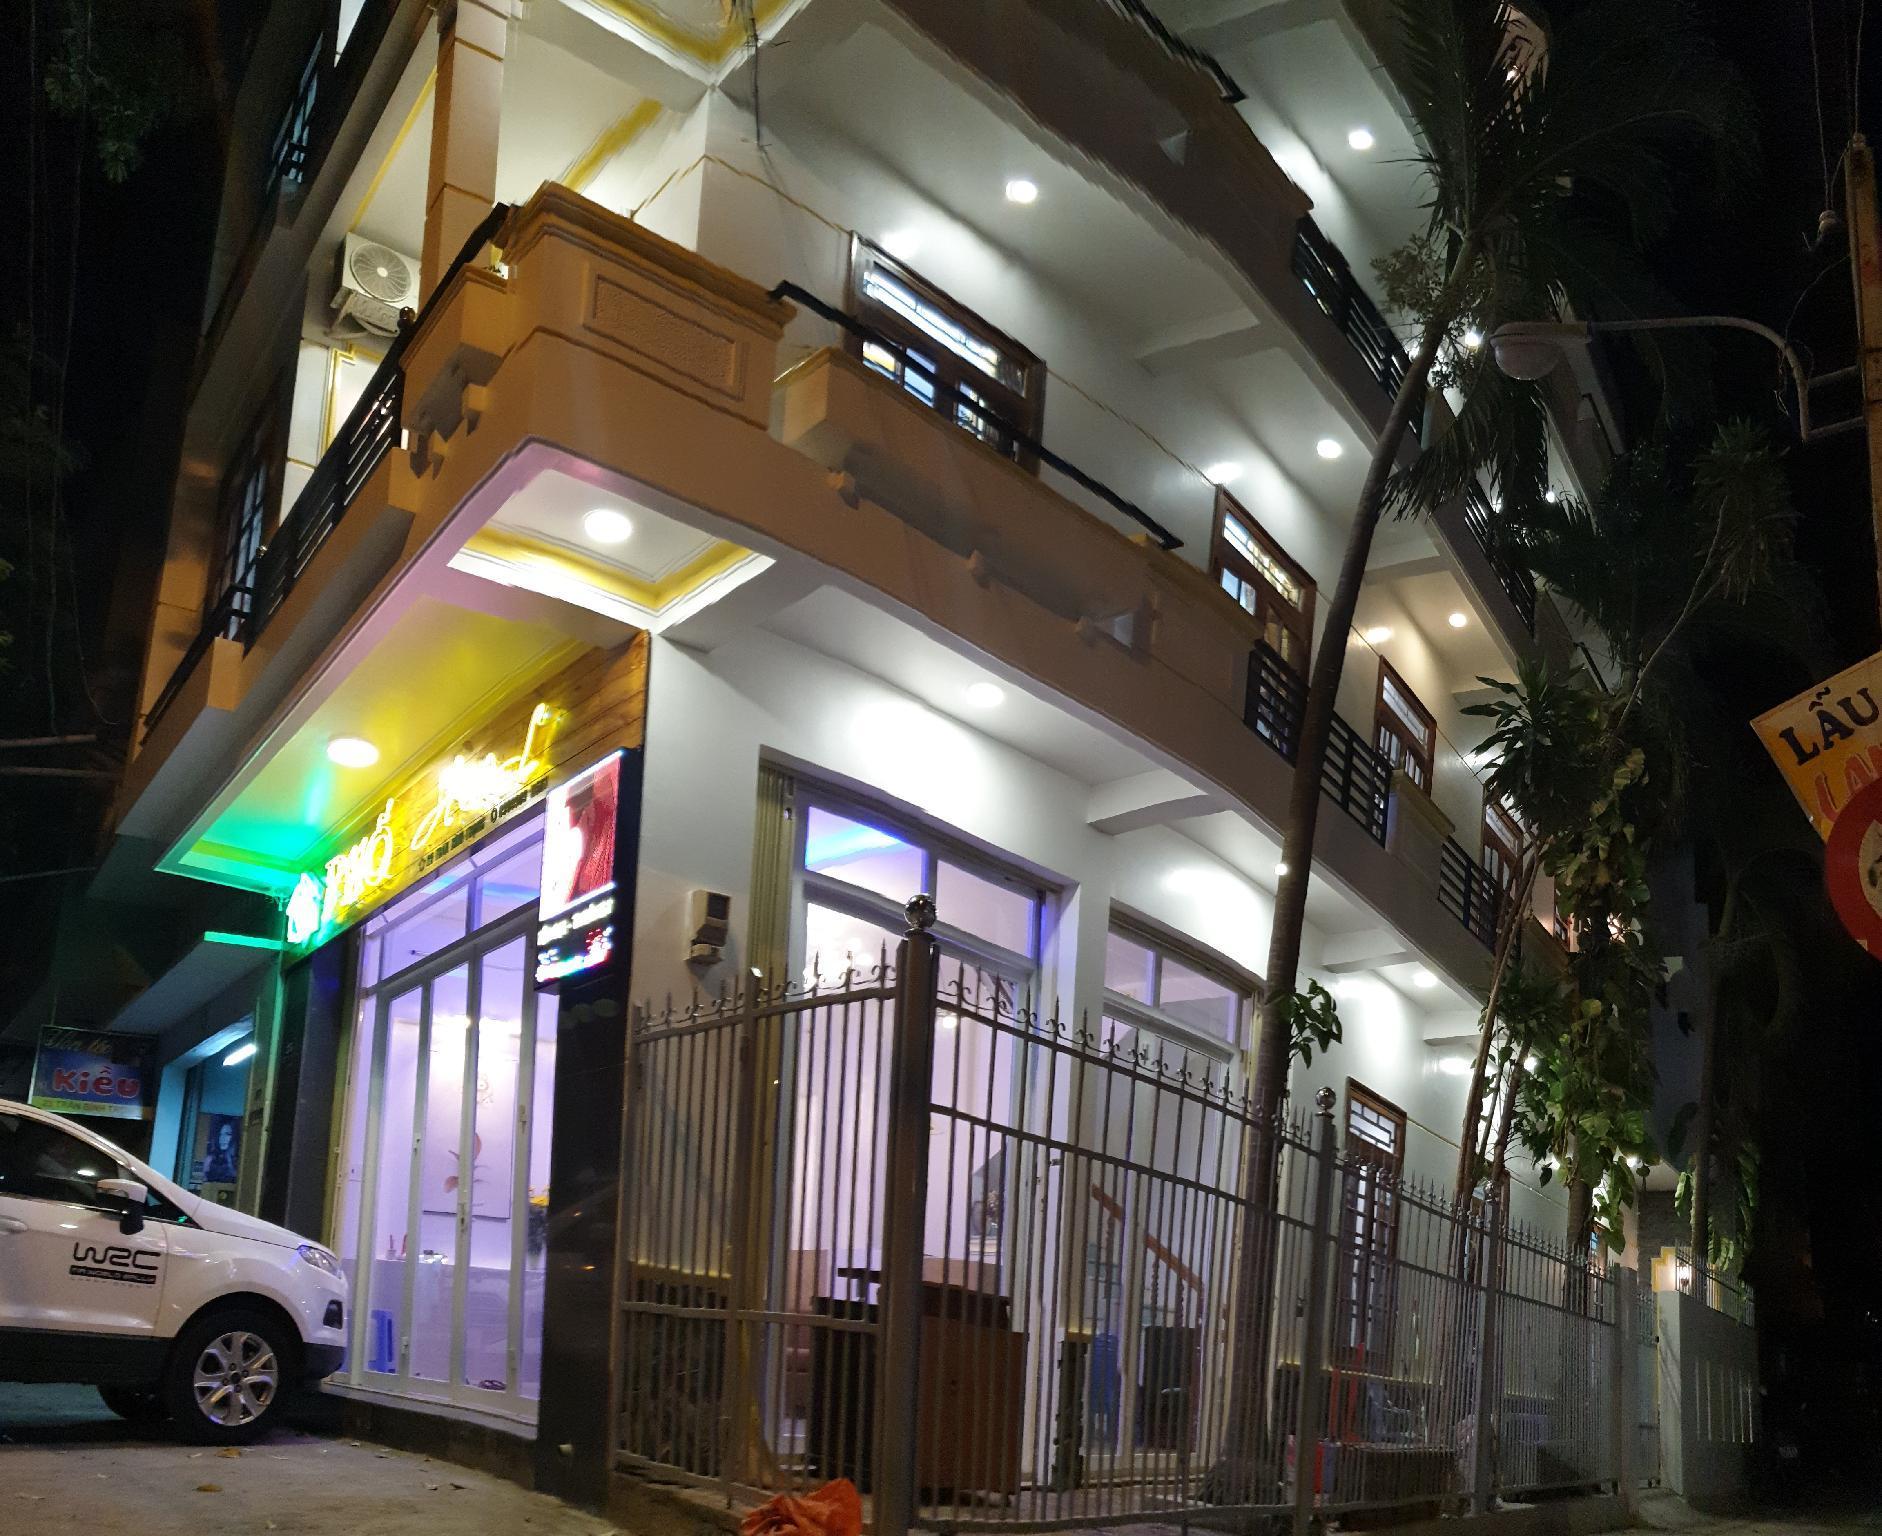 Pho Homestay Tam Dong Cua Closed